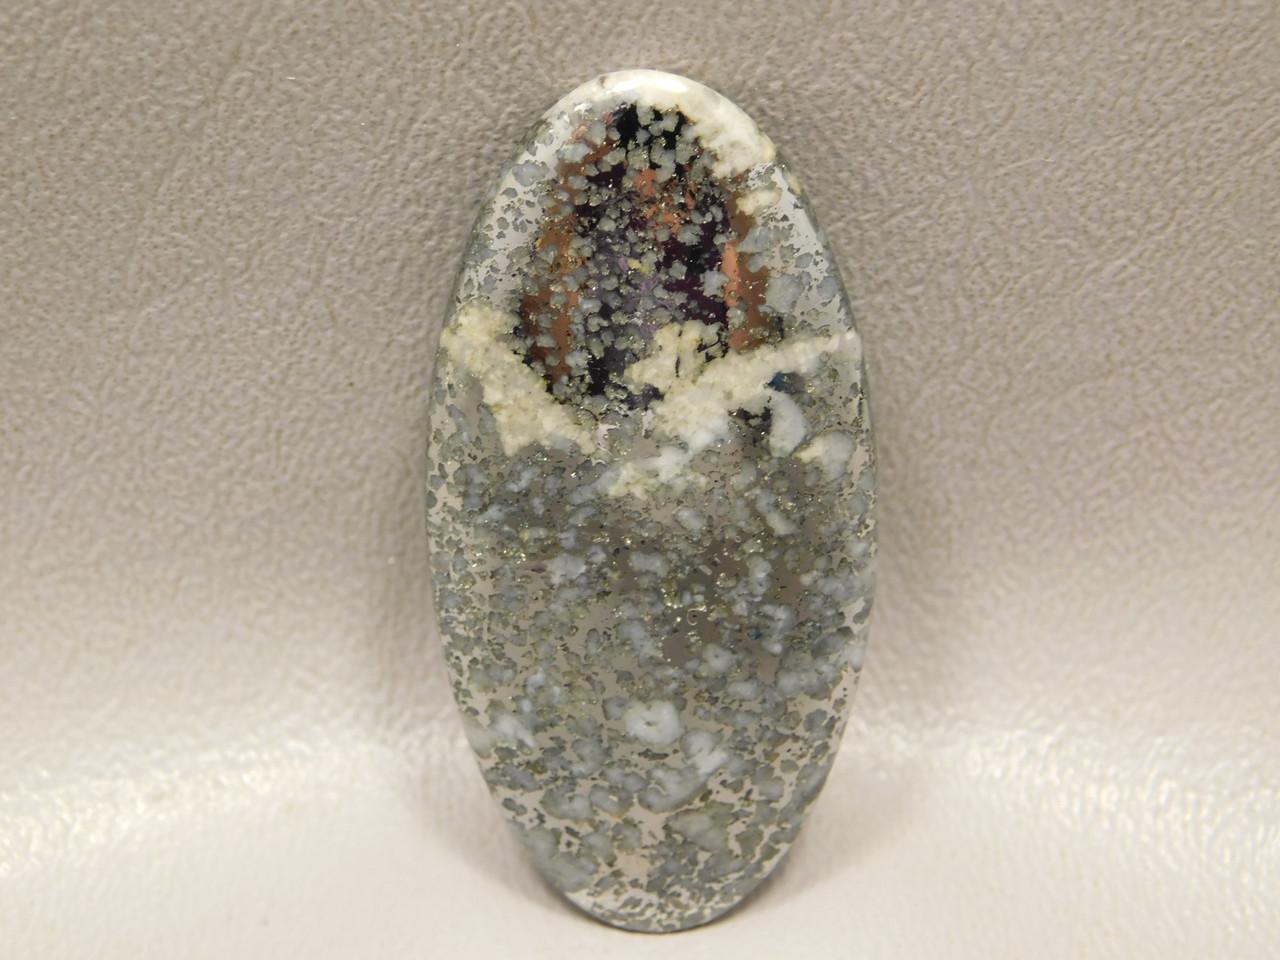 Mohawkite Stone Cabochons Shiny Gold Silver in White Quartz #21